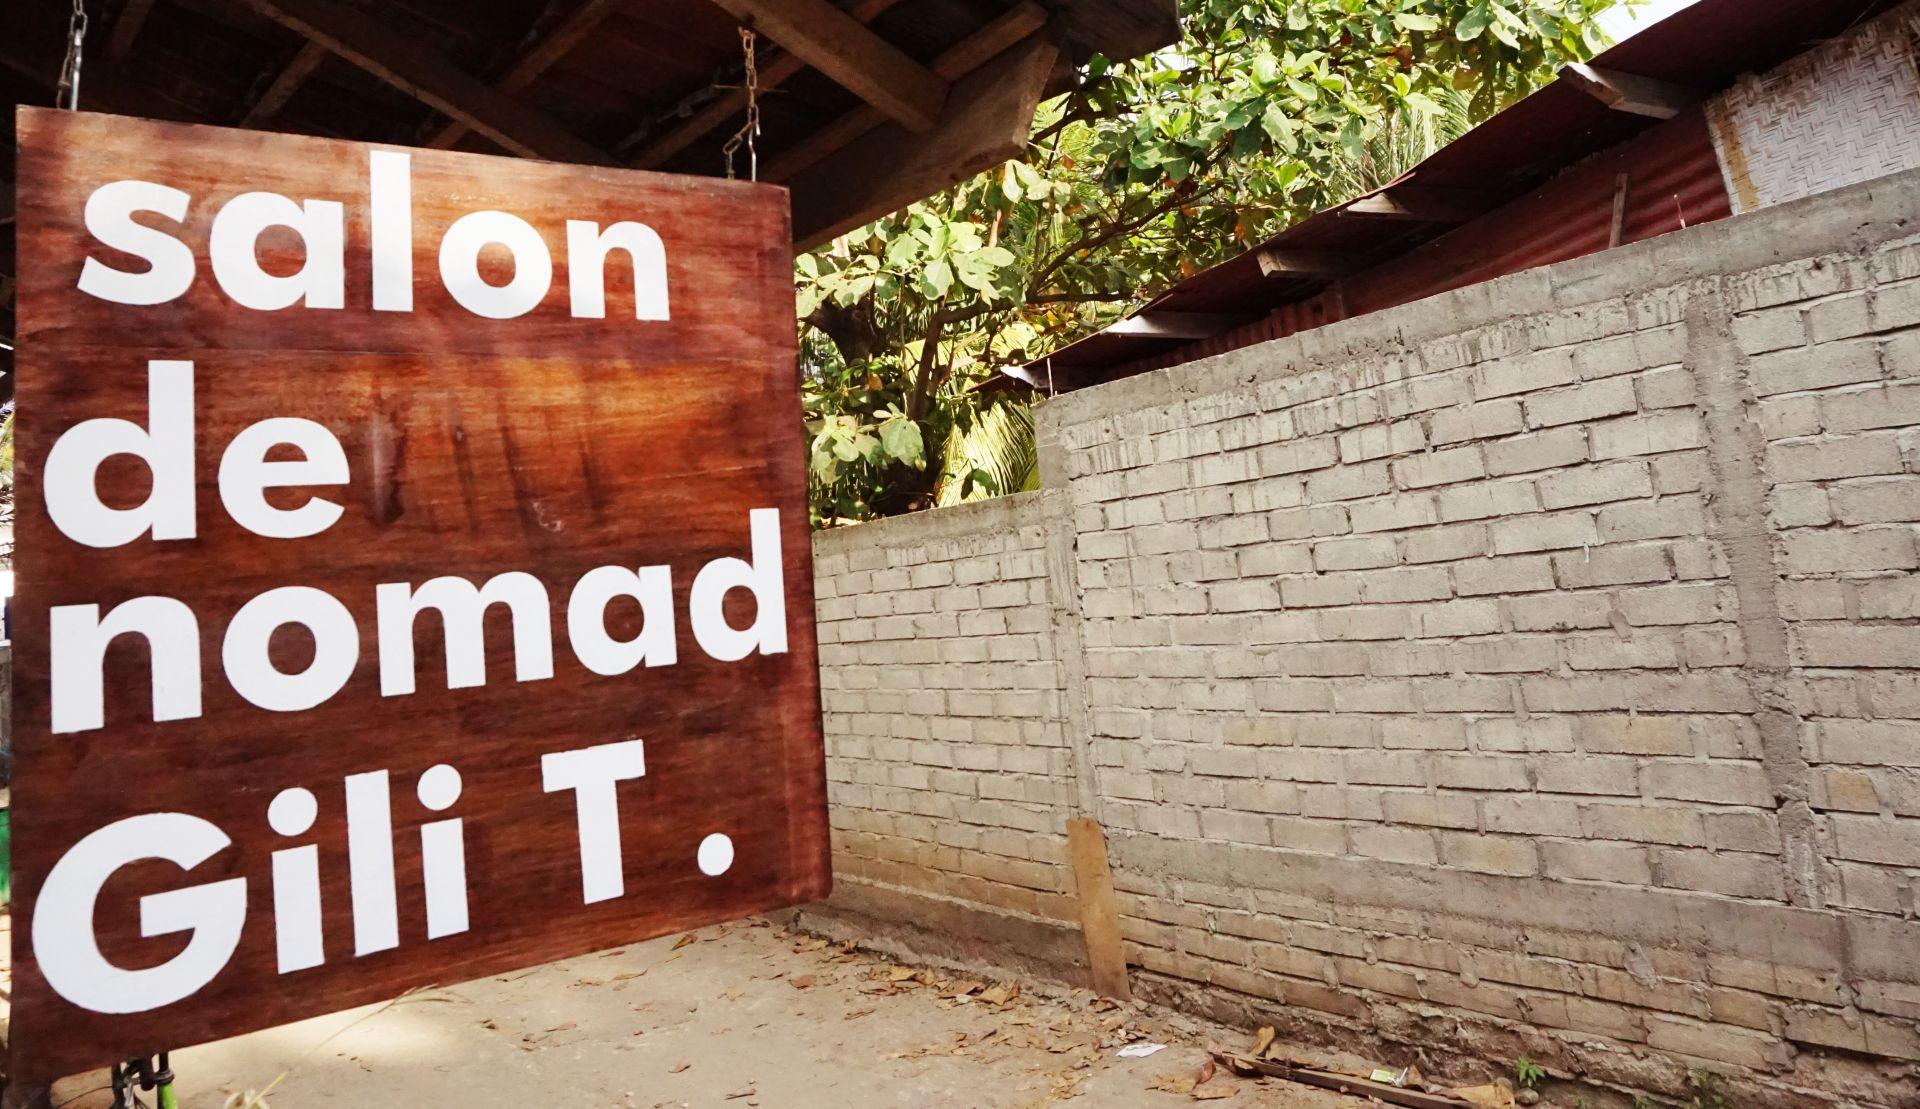 salon de nomad Gili T., Lombok